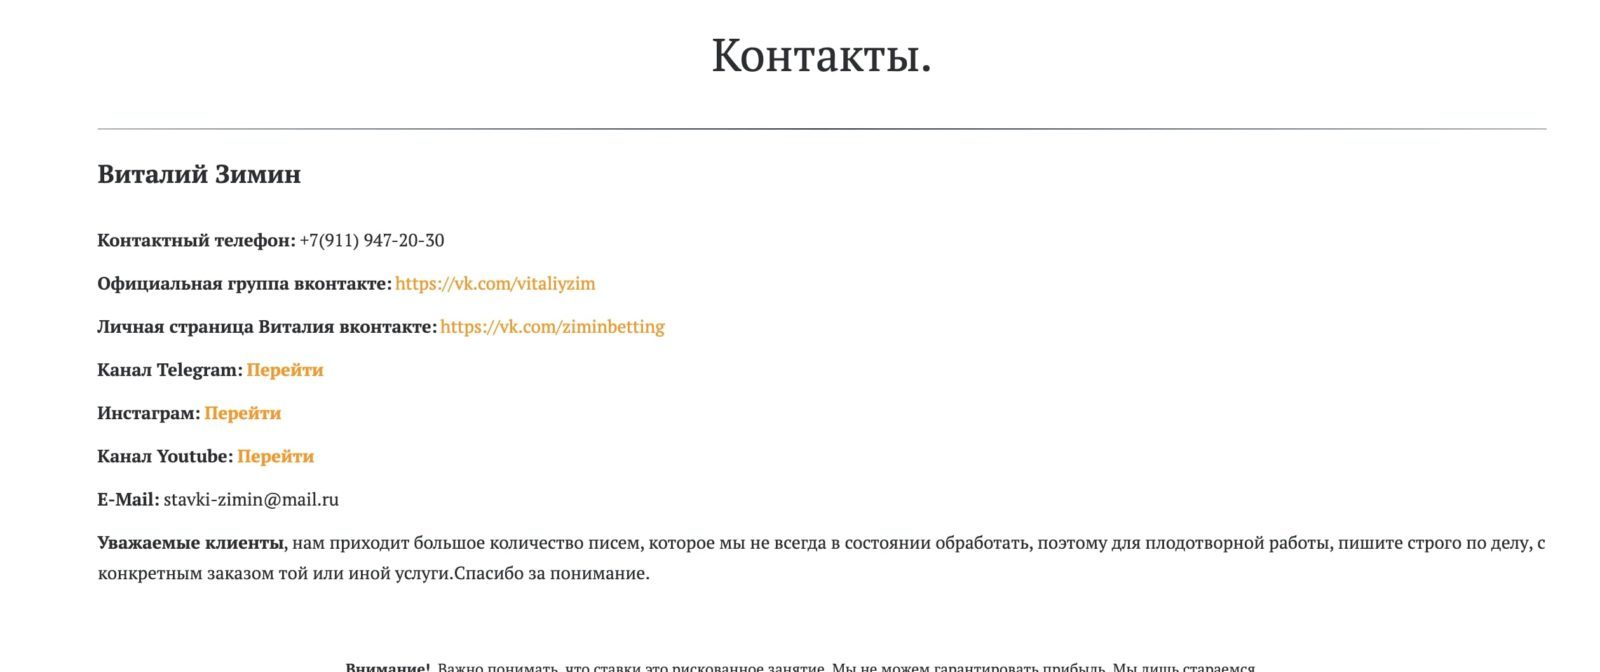 Контакты на сайте каппера Виталий Зимин (Ziminbetting.com)